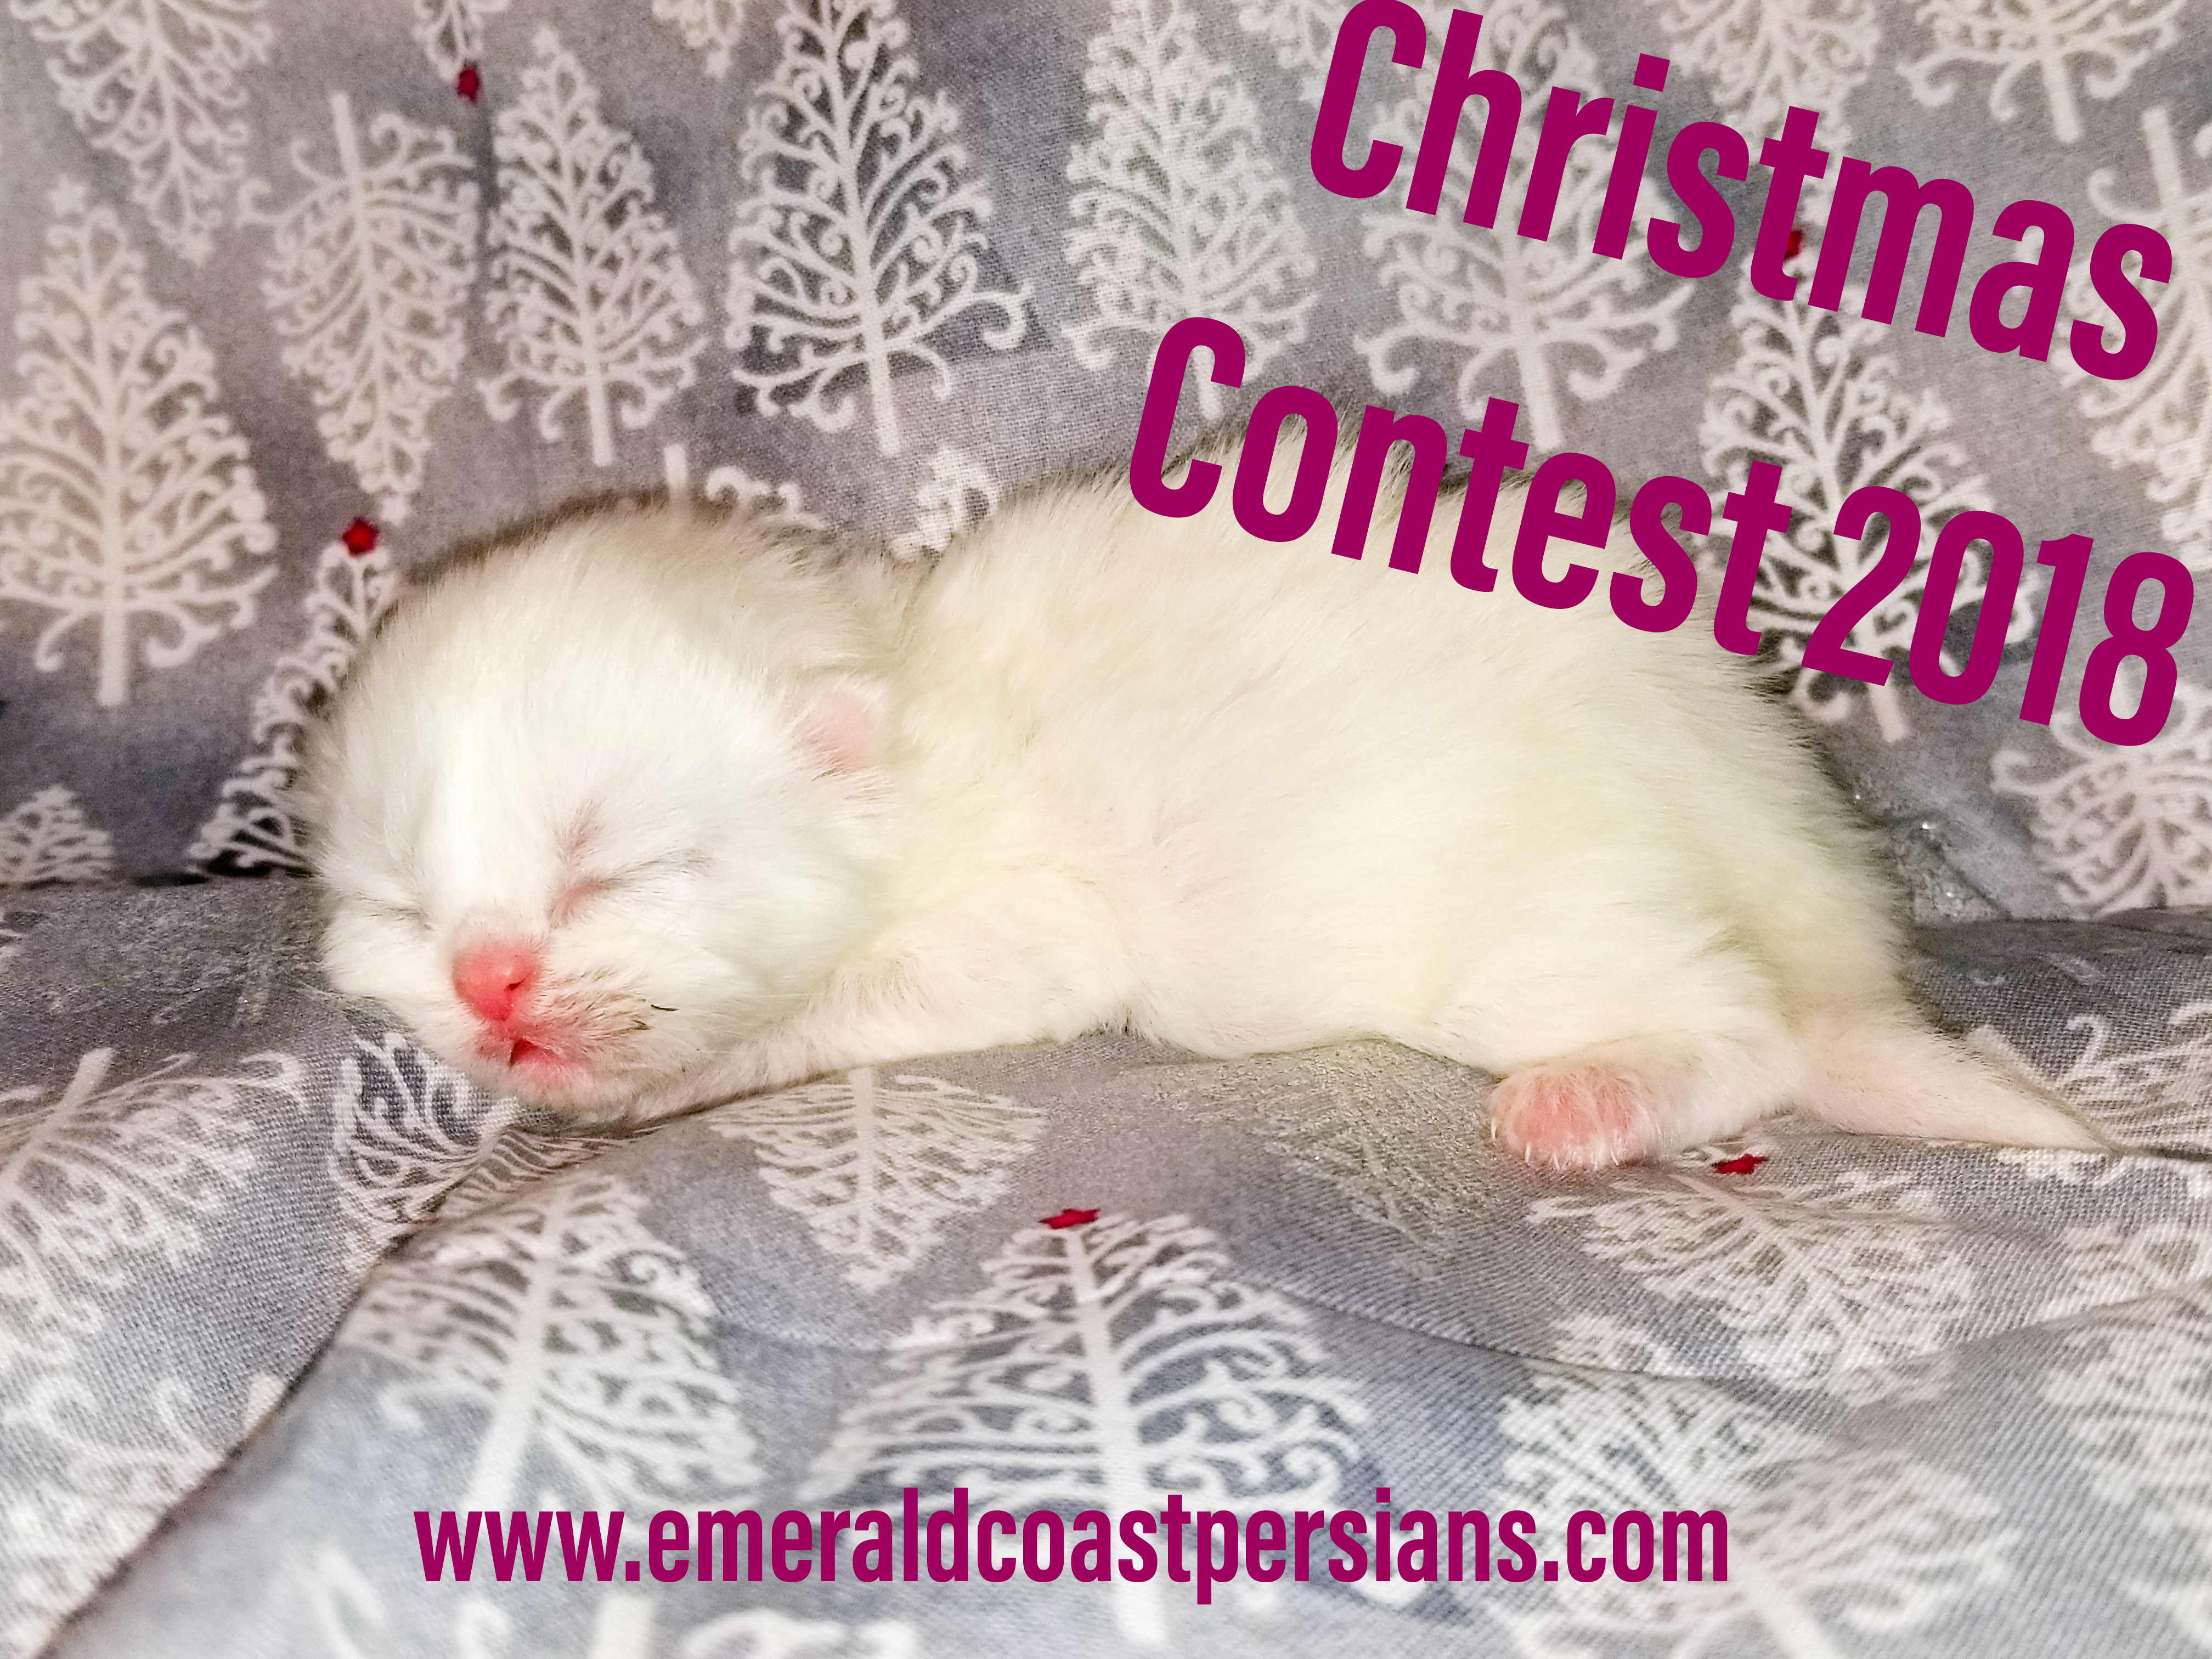 Emerald Coast Persians - Christmas Contest